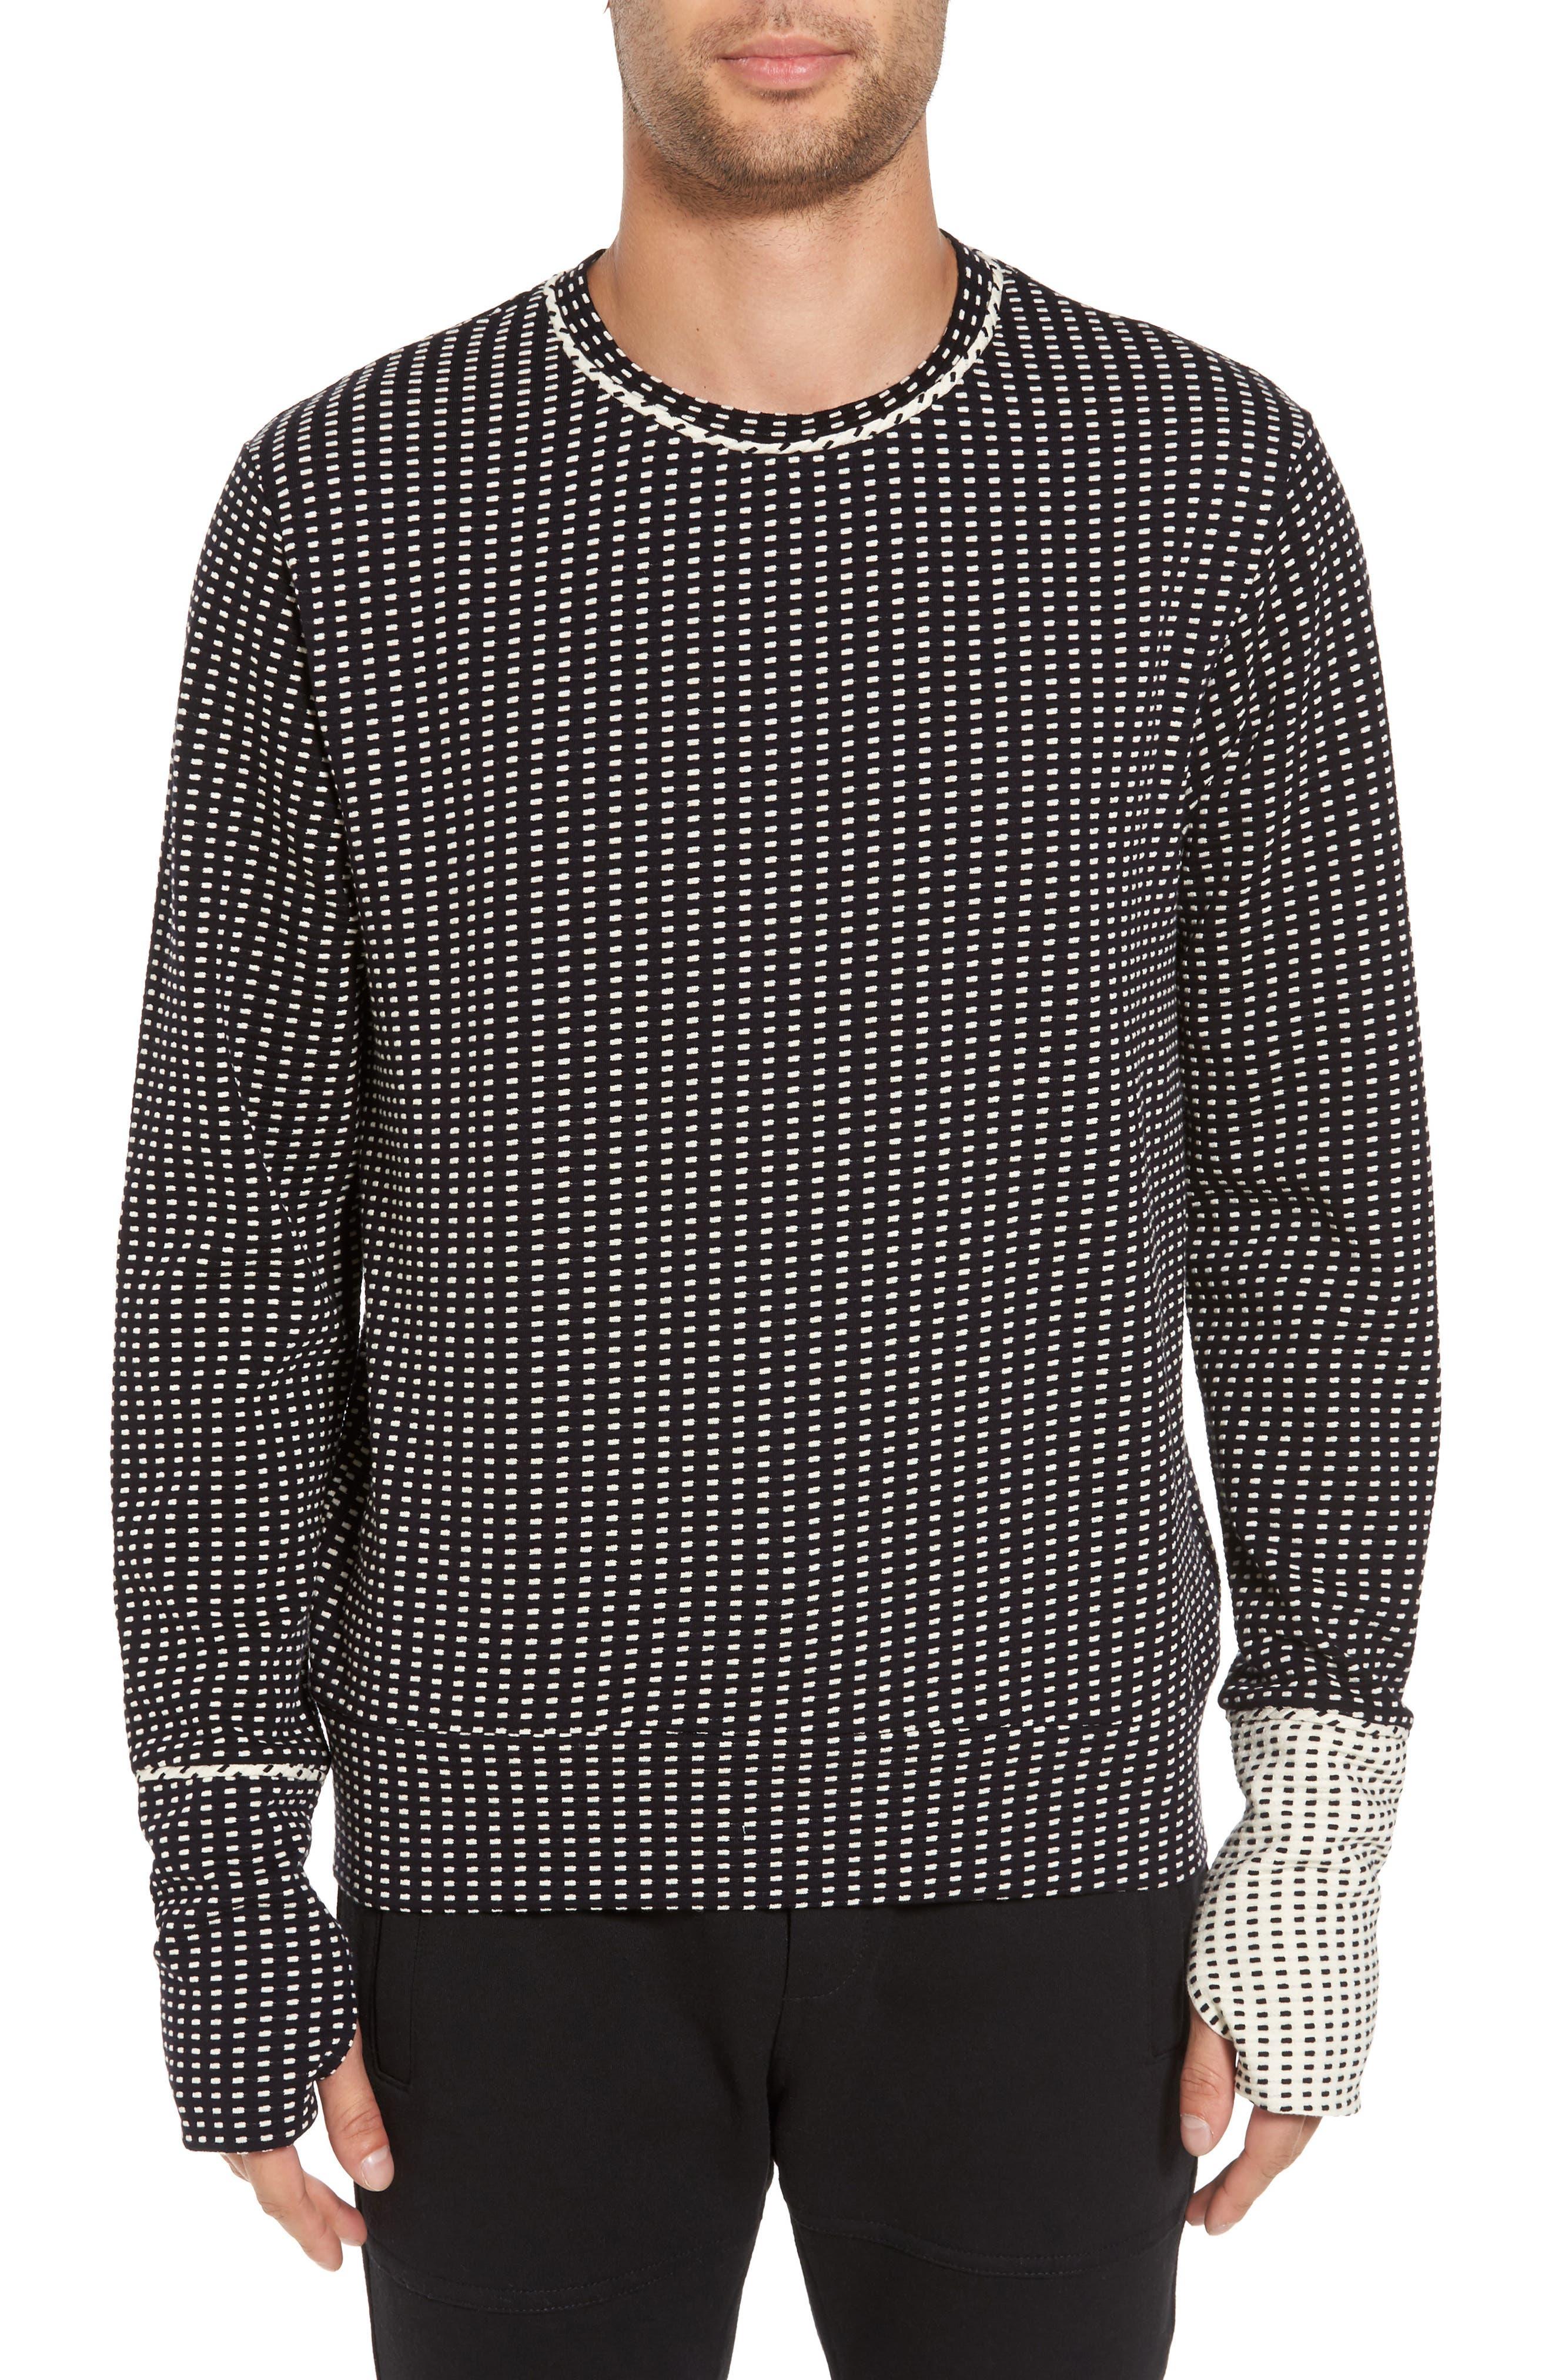 Two-Tone Crewneck Sweater,                         Main,                         color, Black